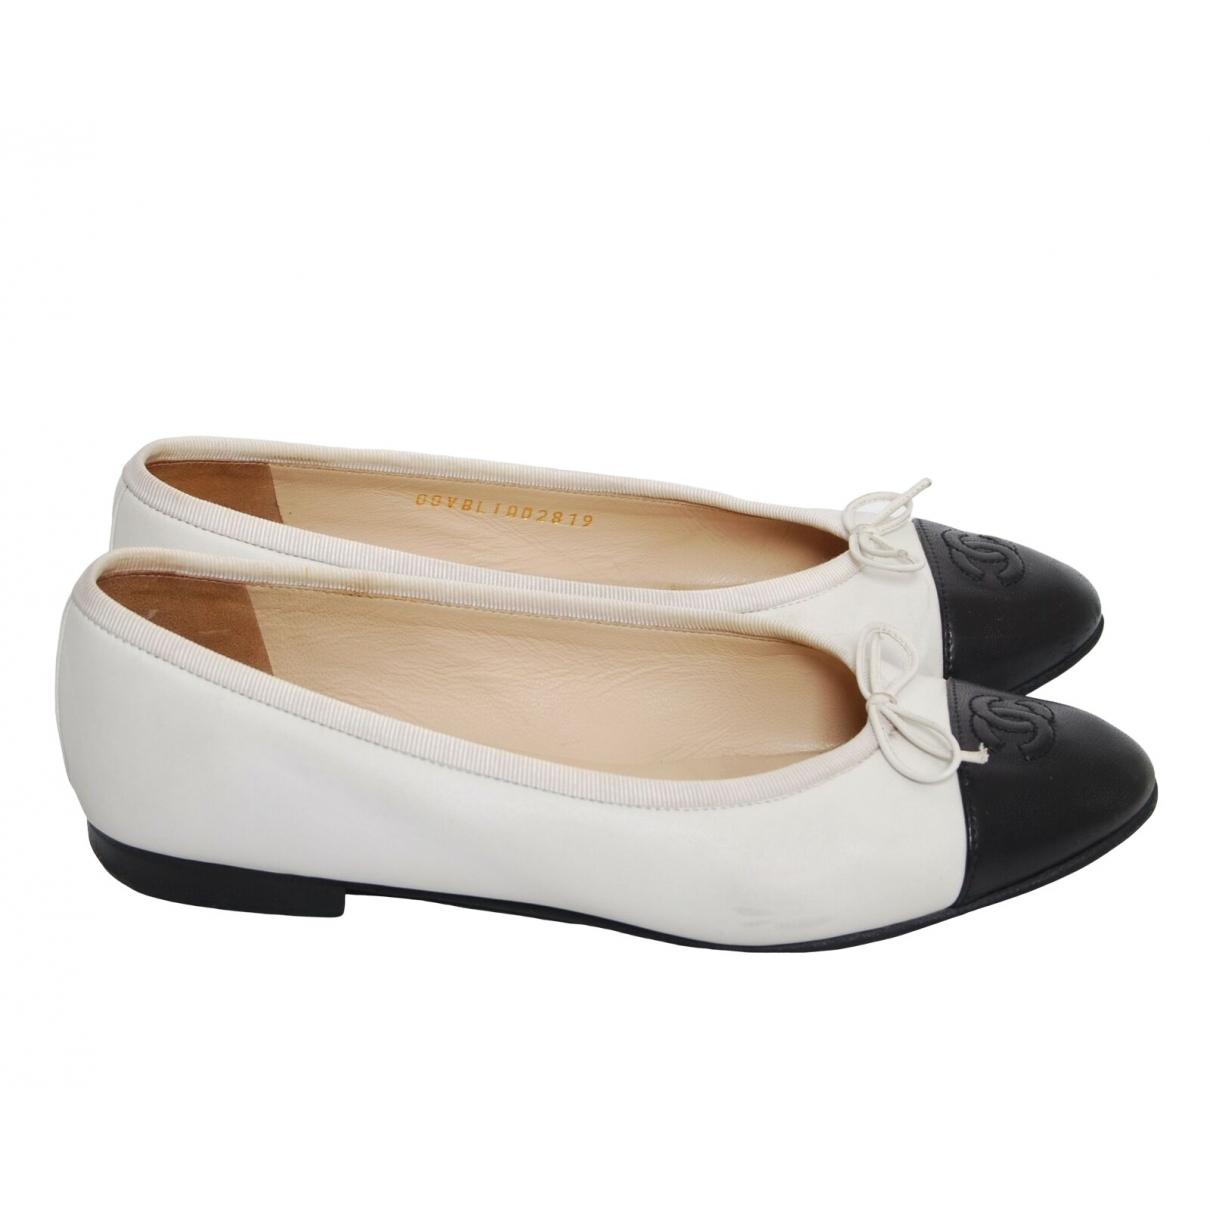 Chanel \N Ballerinas in  Weiss Leder